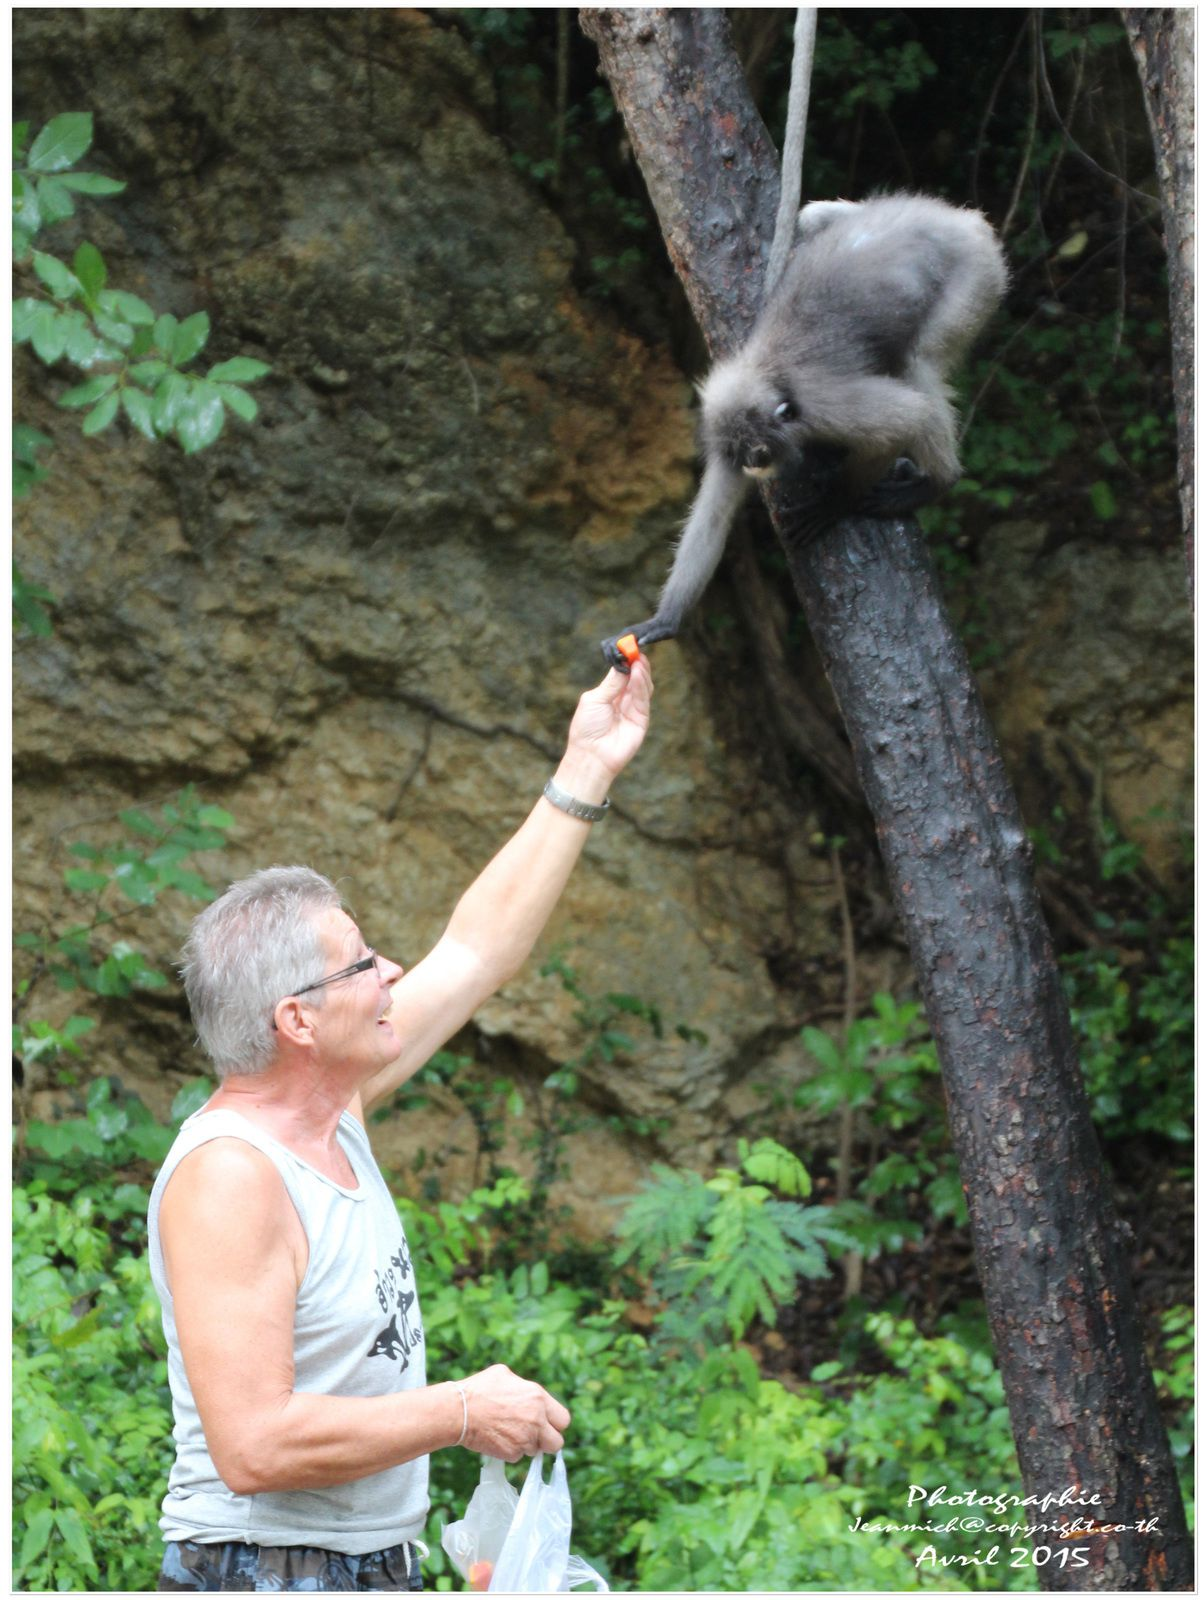 Visite des environs de Prachuap Kiri Kan..., les gibbons